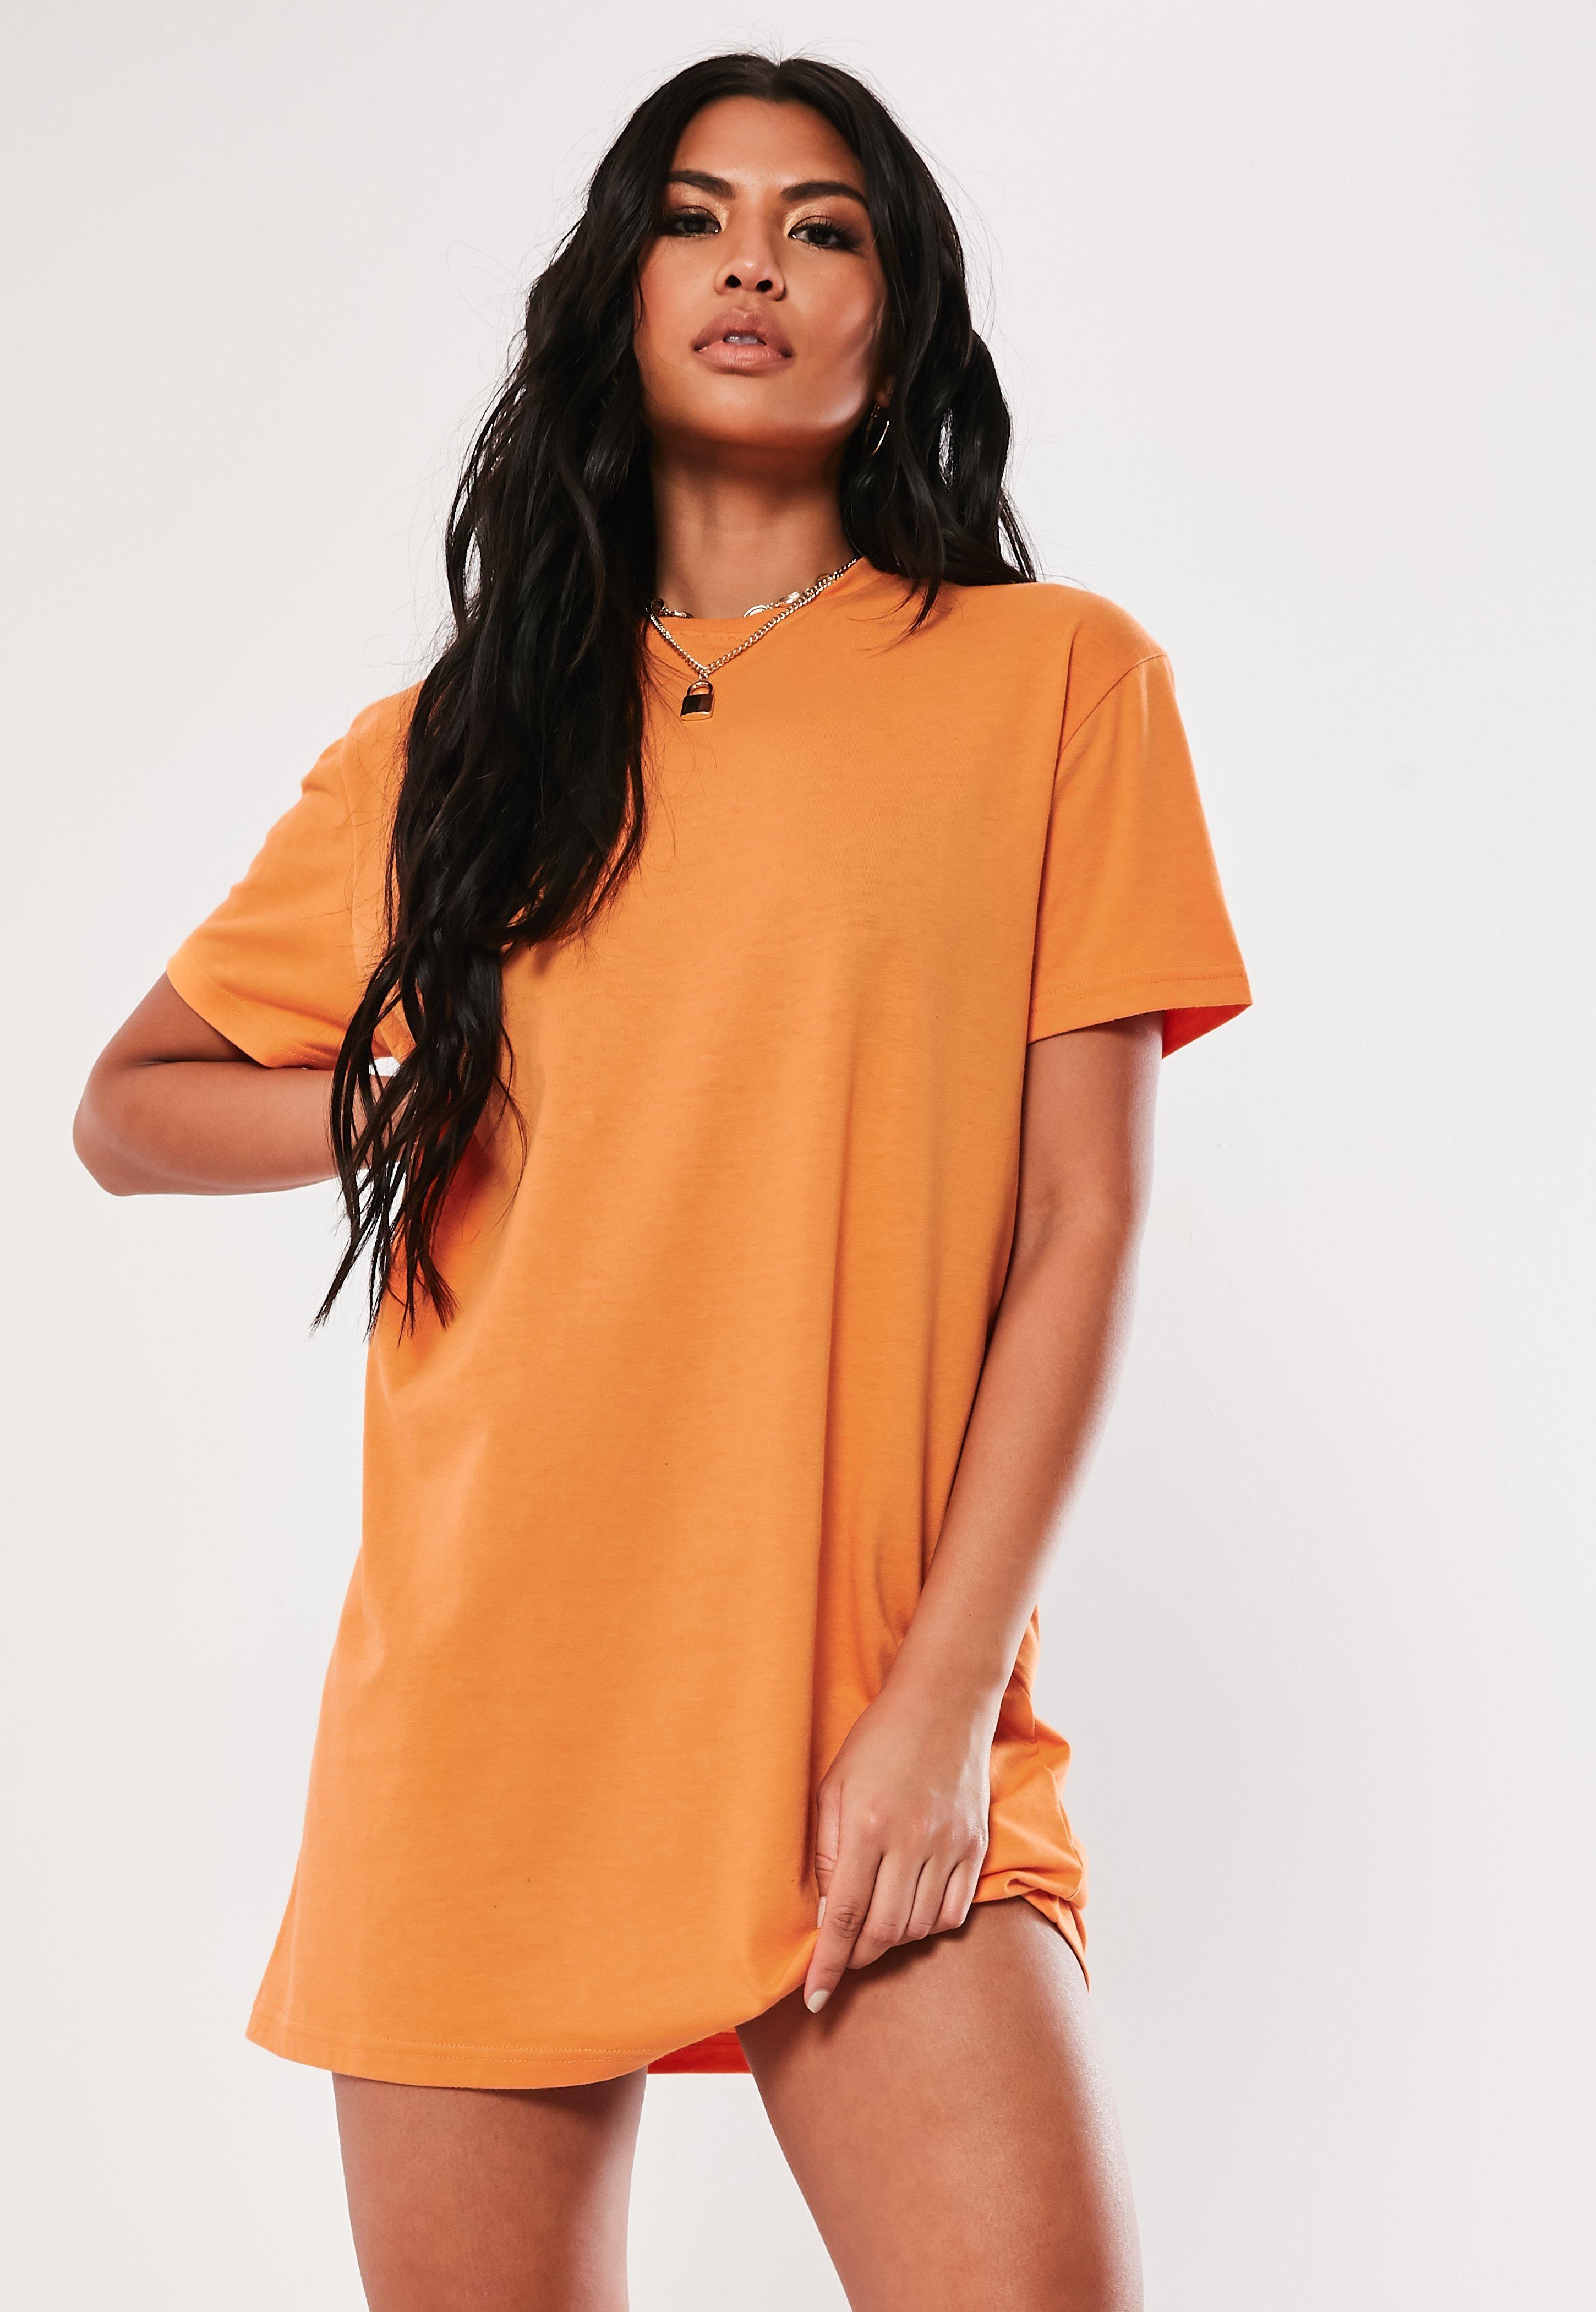 cd6c57dc6dd0 T Shirt Dresses | Printed & Slogan T-Shirt Dresses - Missguided